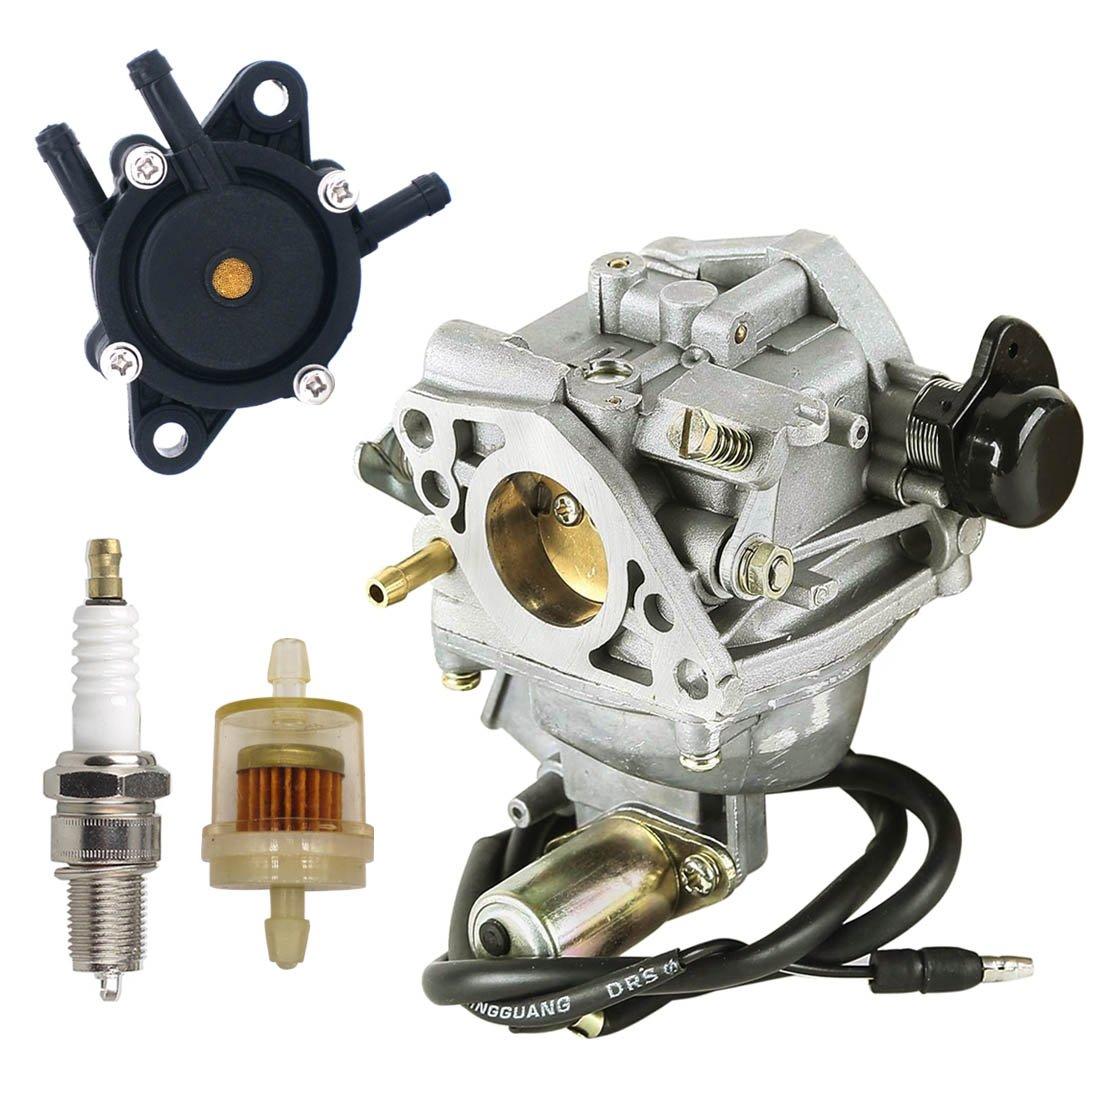 Amazon.com: NIMTEK 16100-ZJ0-871 Carburetor with Fuel Pump Spark Plug Fuel  Filter for Honda GX610 18HP & GX620 20HP Engine: Automotive